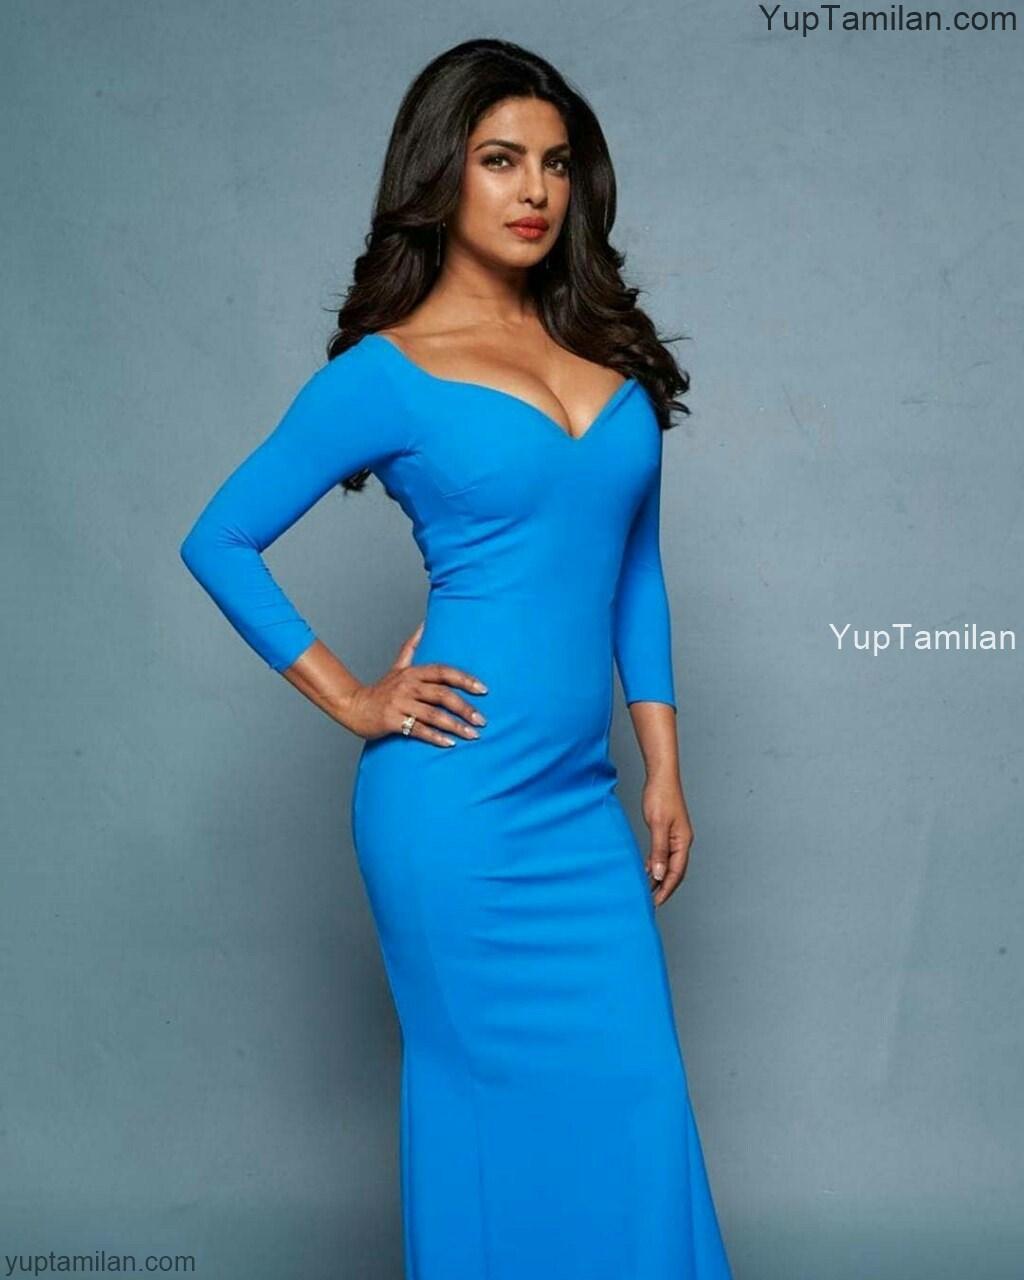 Priyanka Chopra Hot Photo Gallery-Best Ever Image -3550